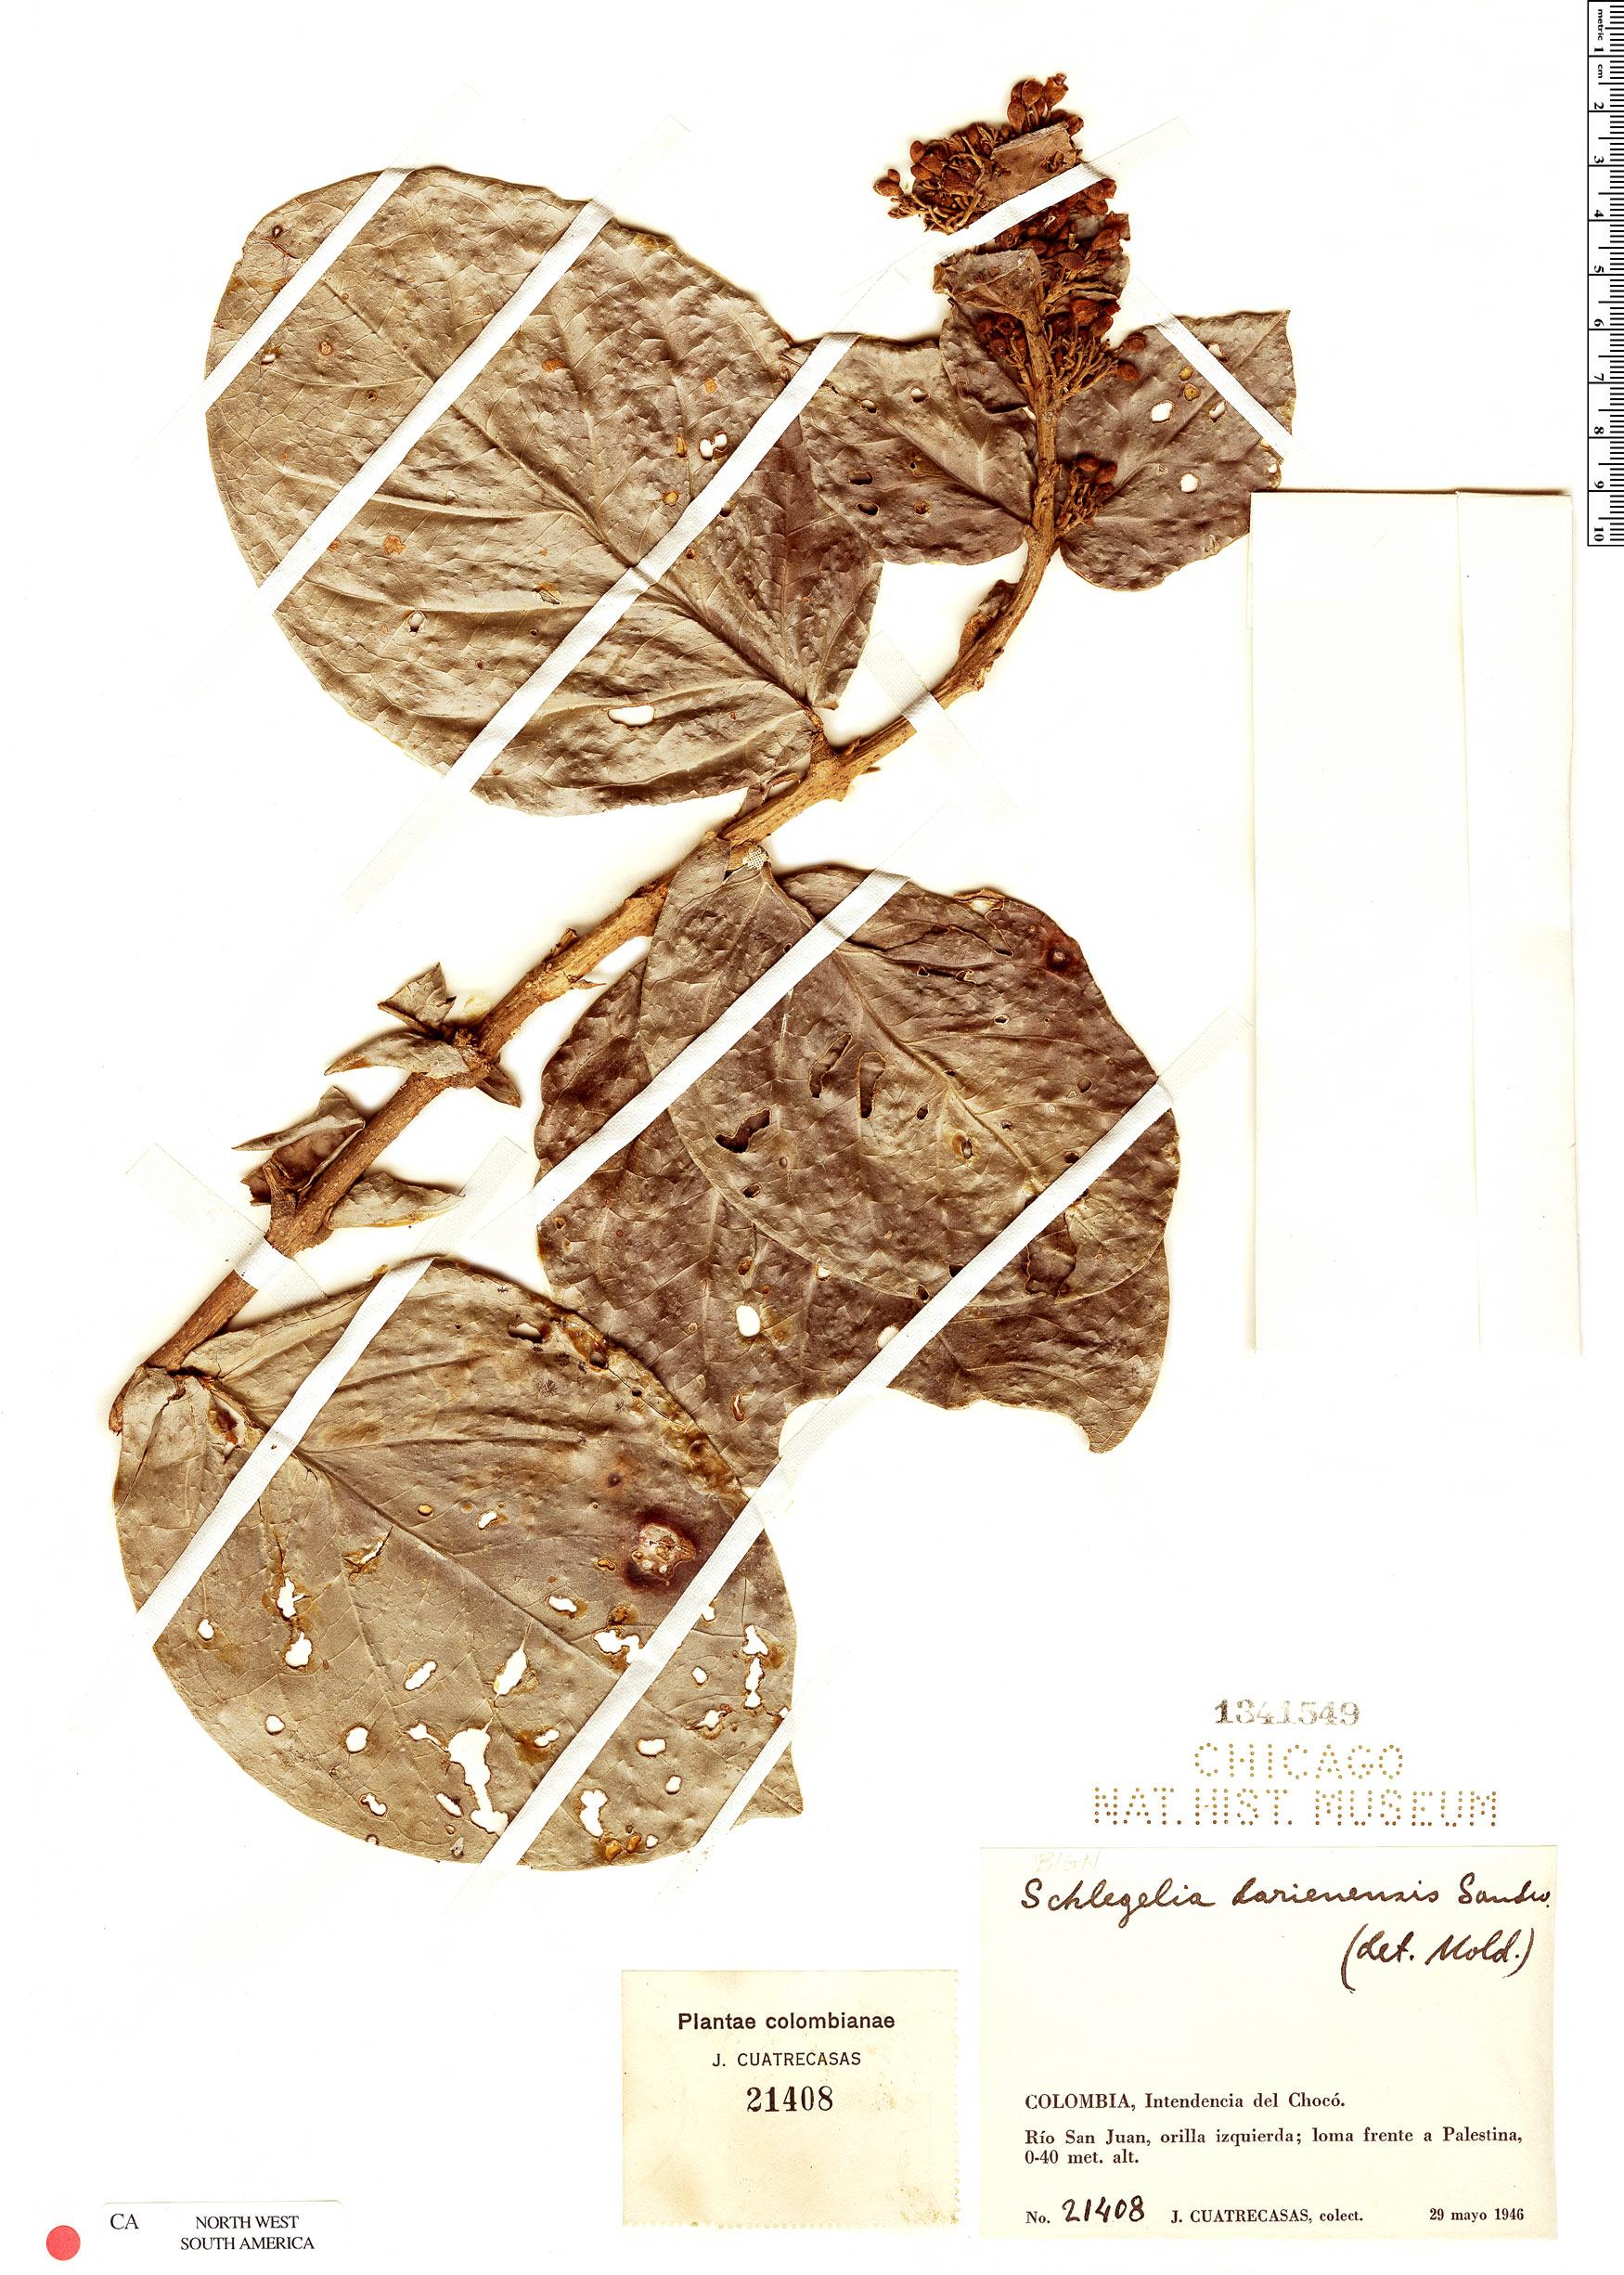 Specimen: Schlegelia darienensis